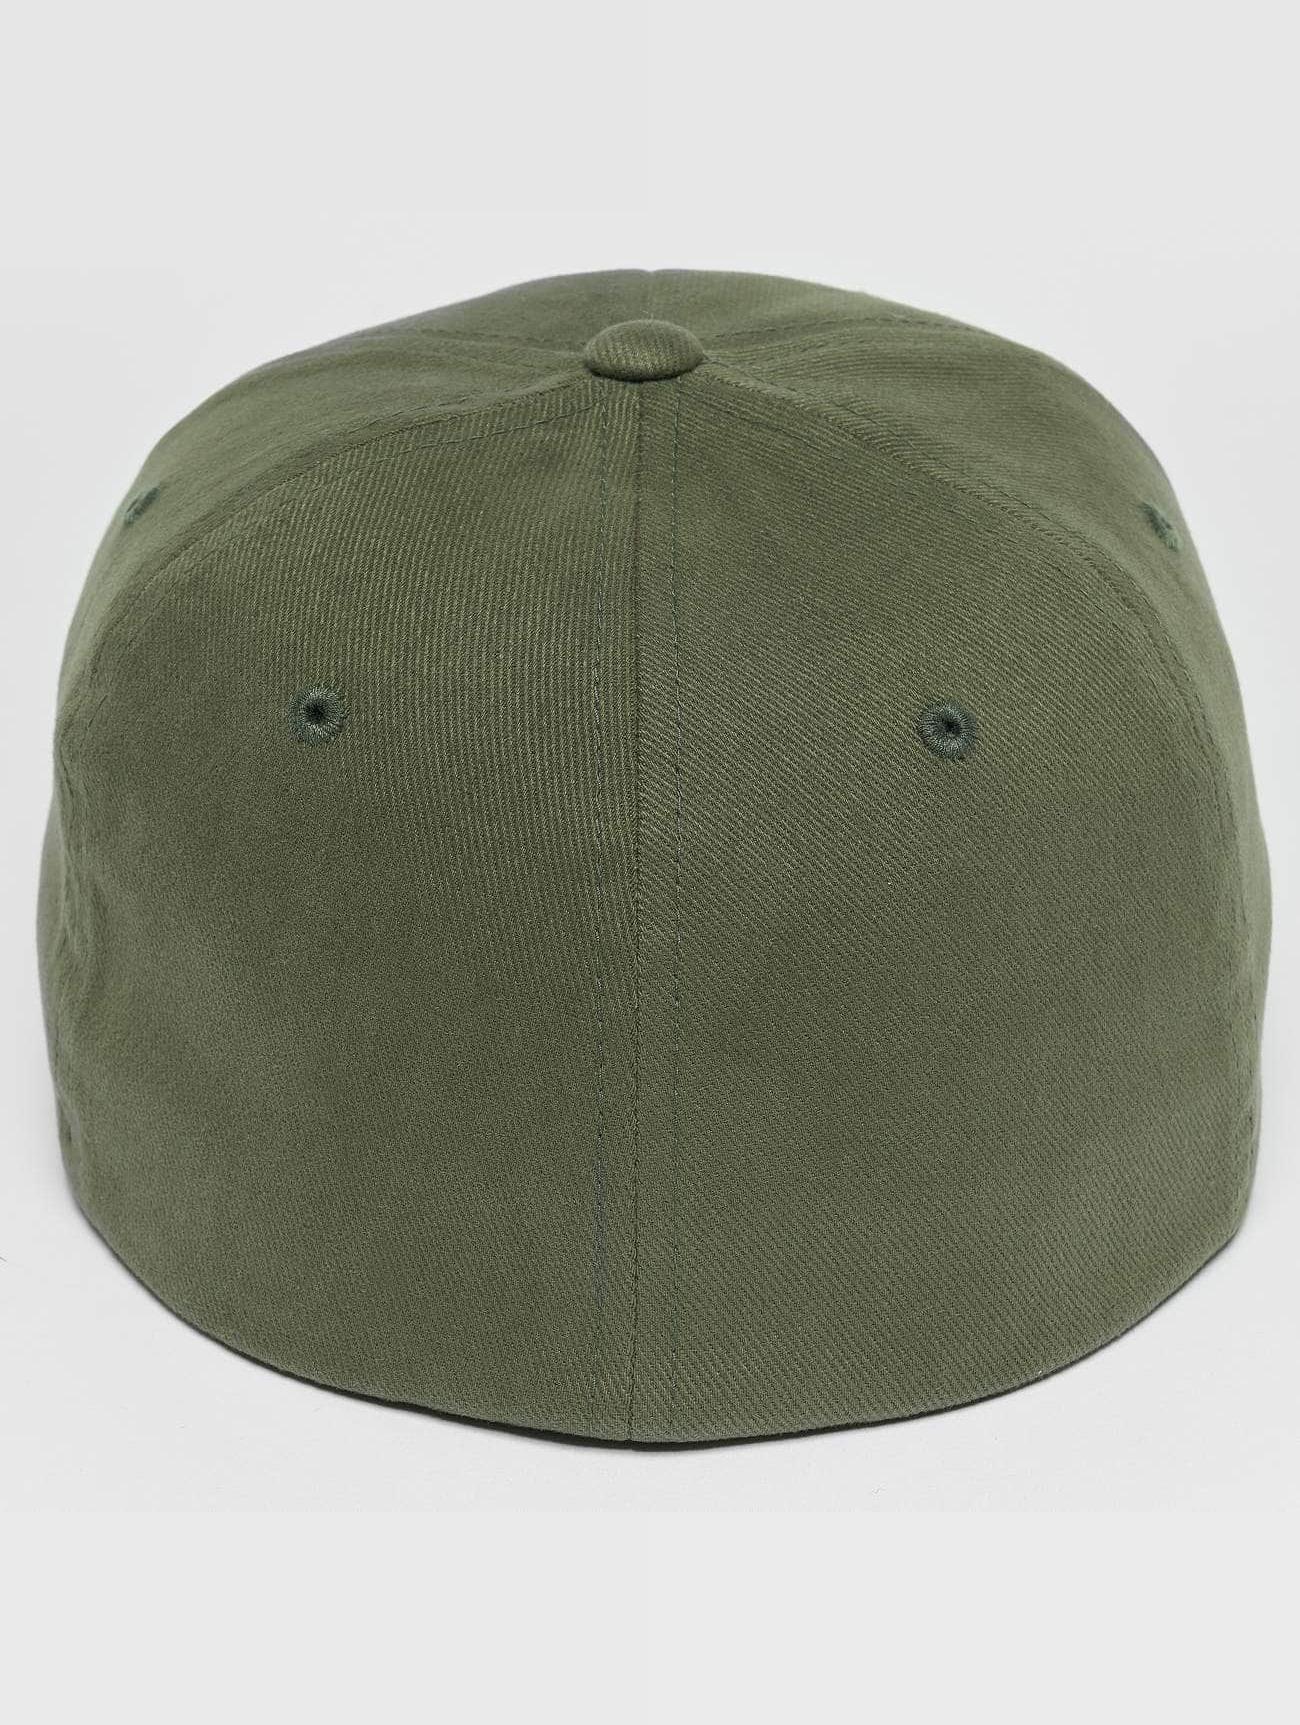 Flexfit  Twill Brushed  vert  Casquette Flex Fitted  477374 Homme Casquettes